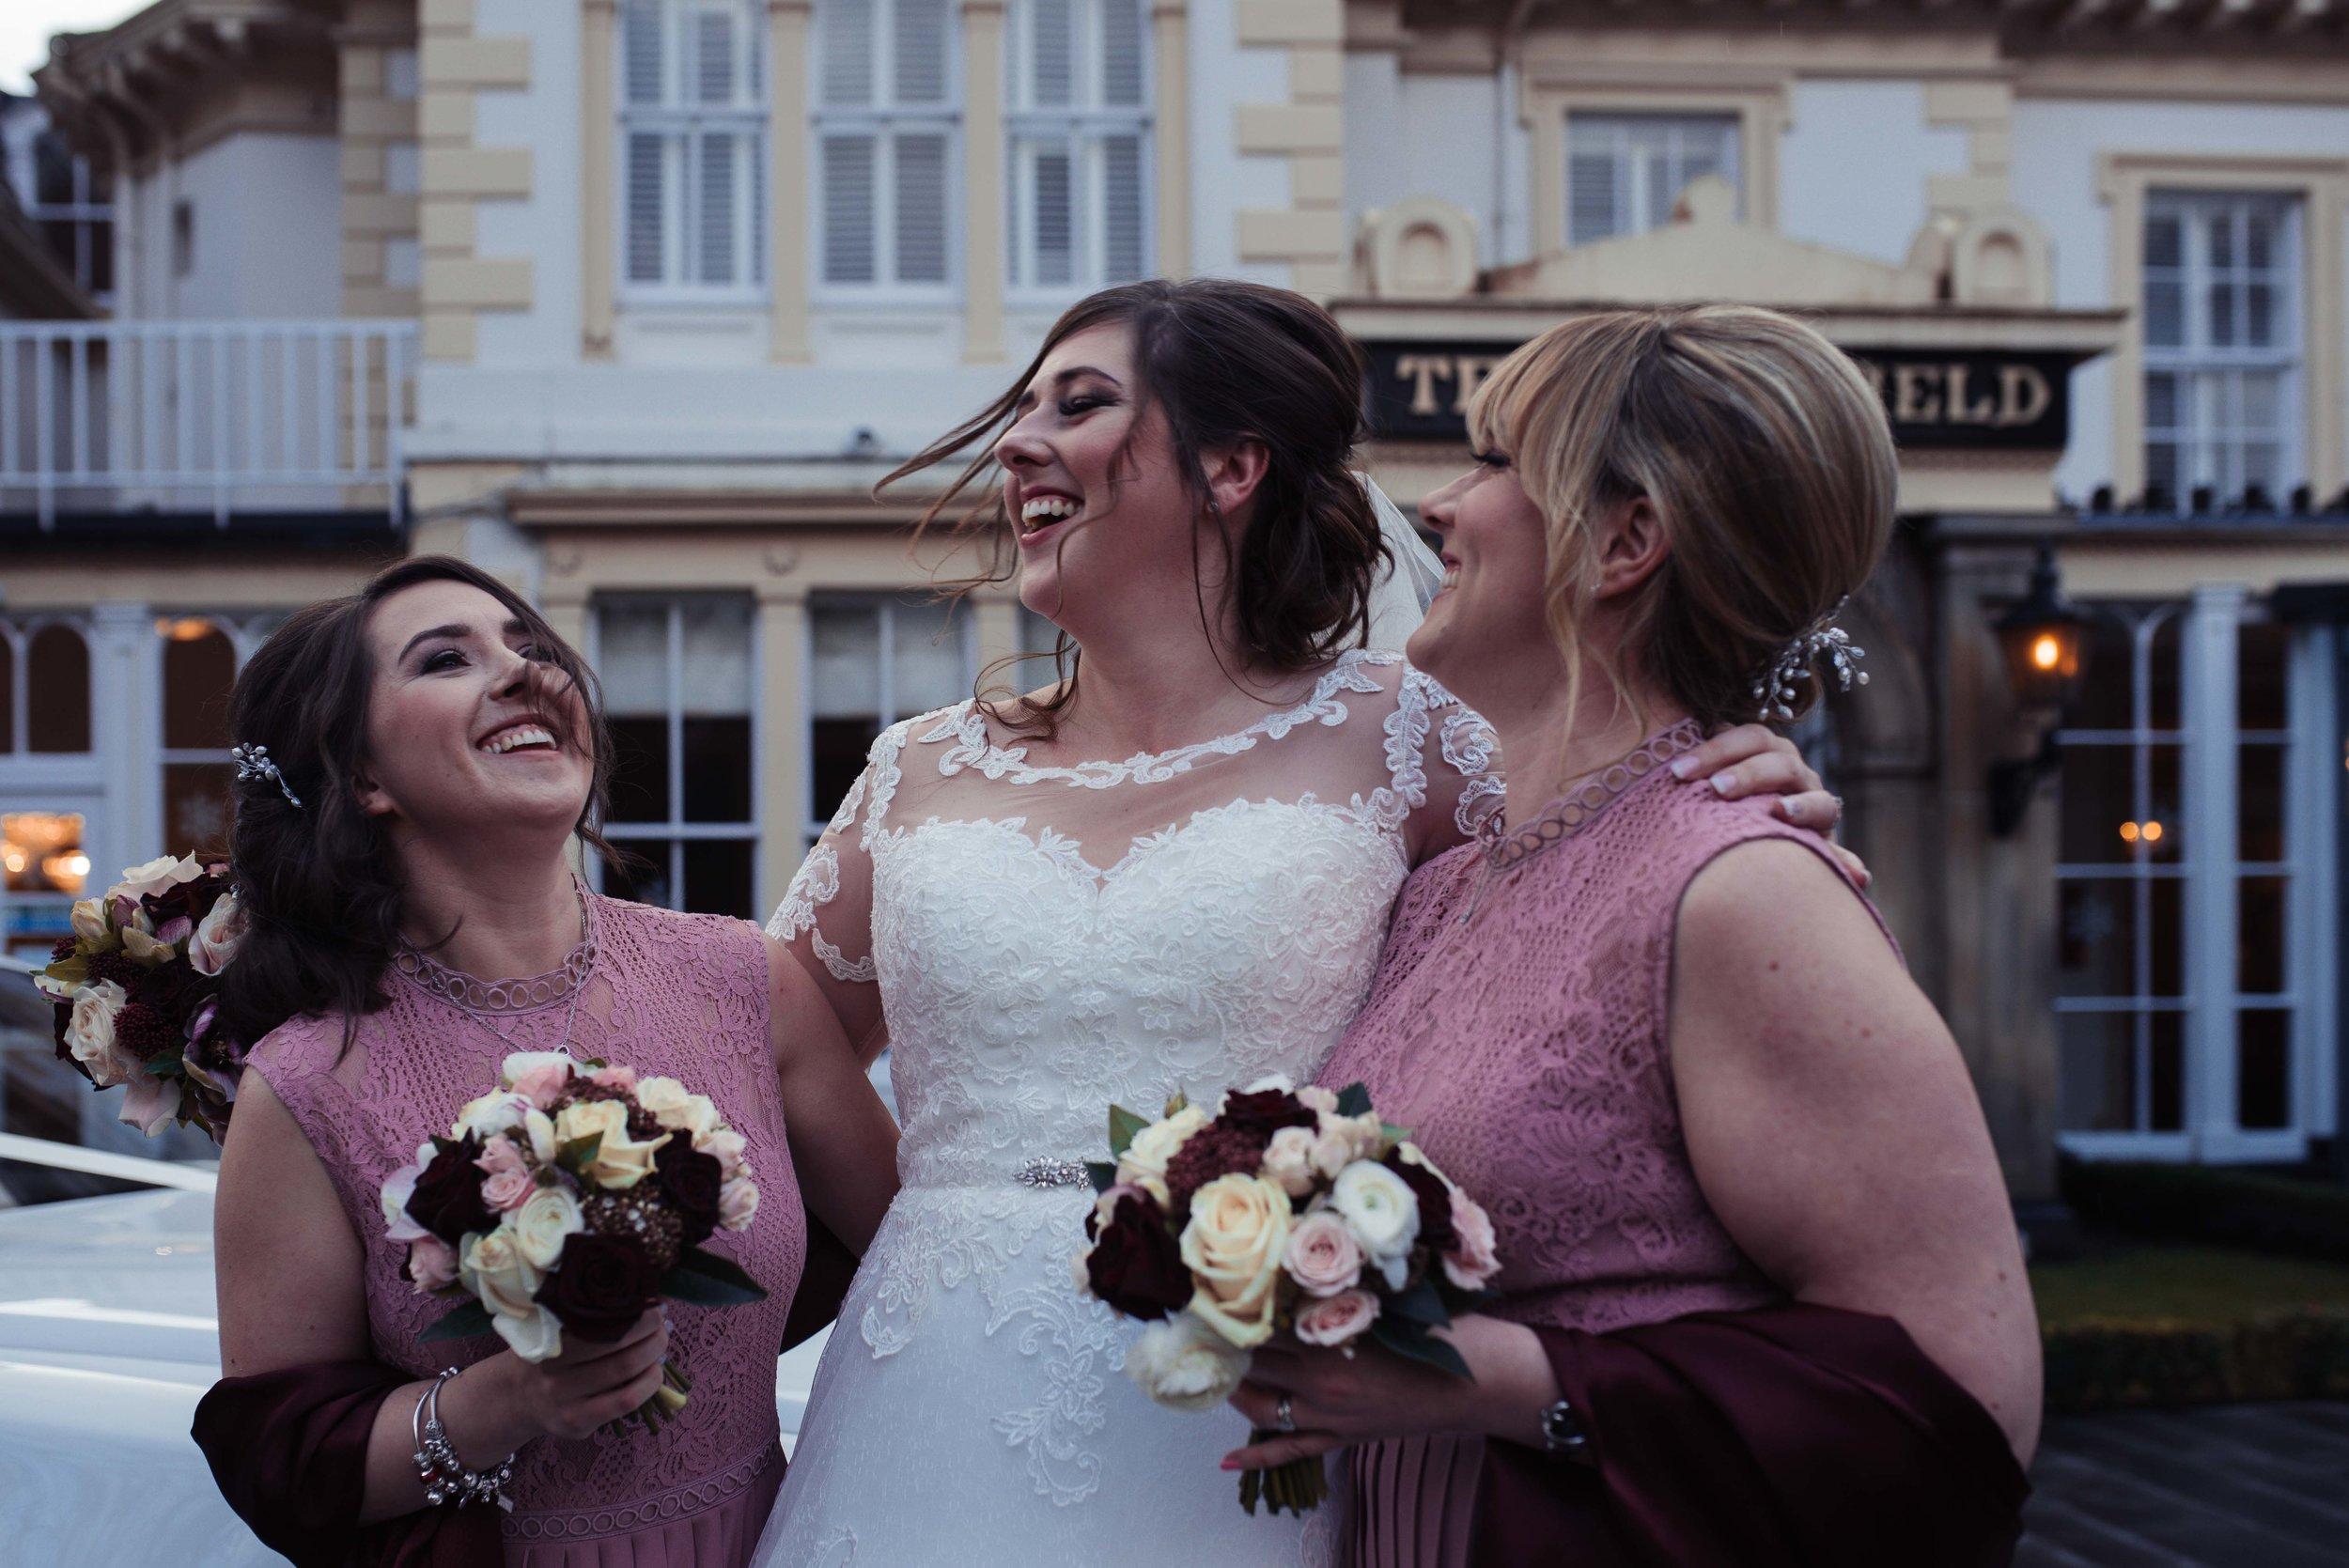 Belsfield-wedding-photography-20.jpg